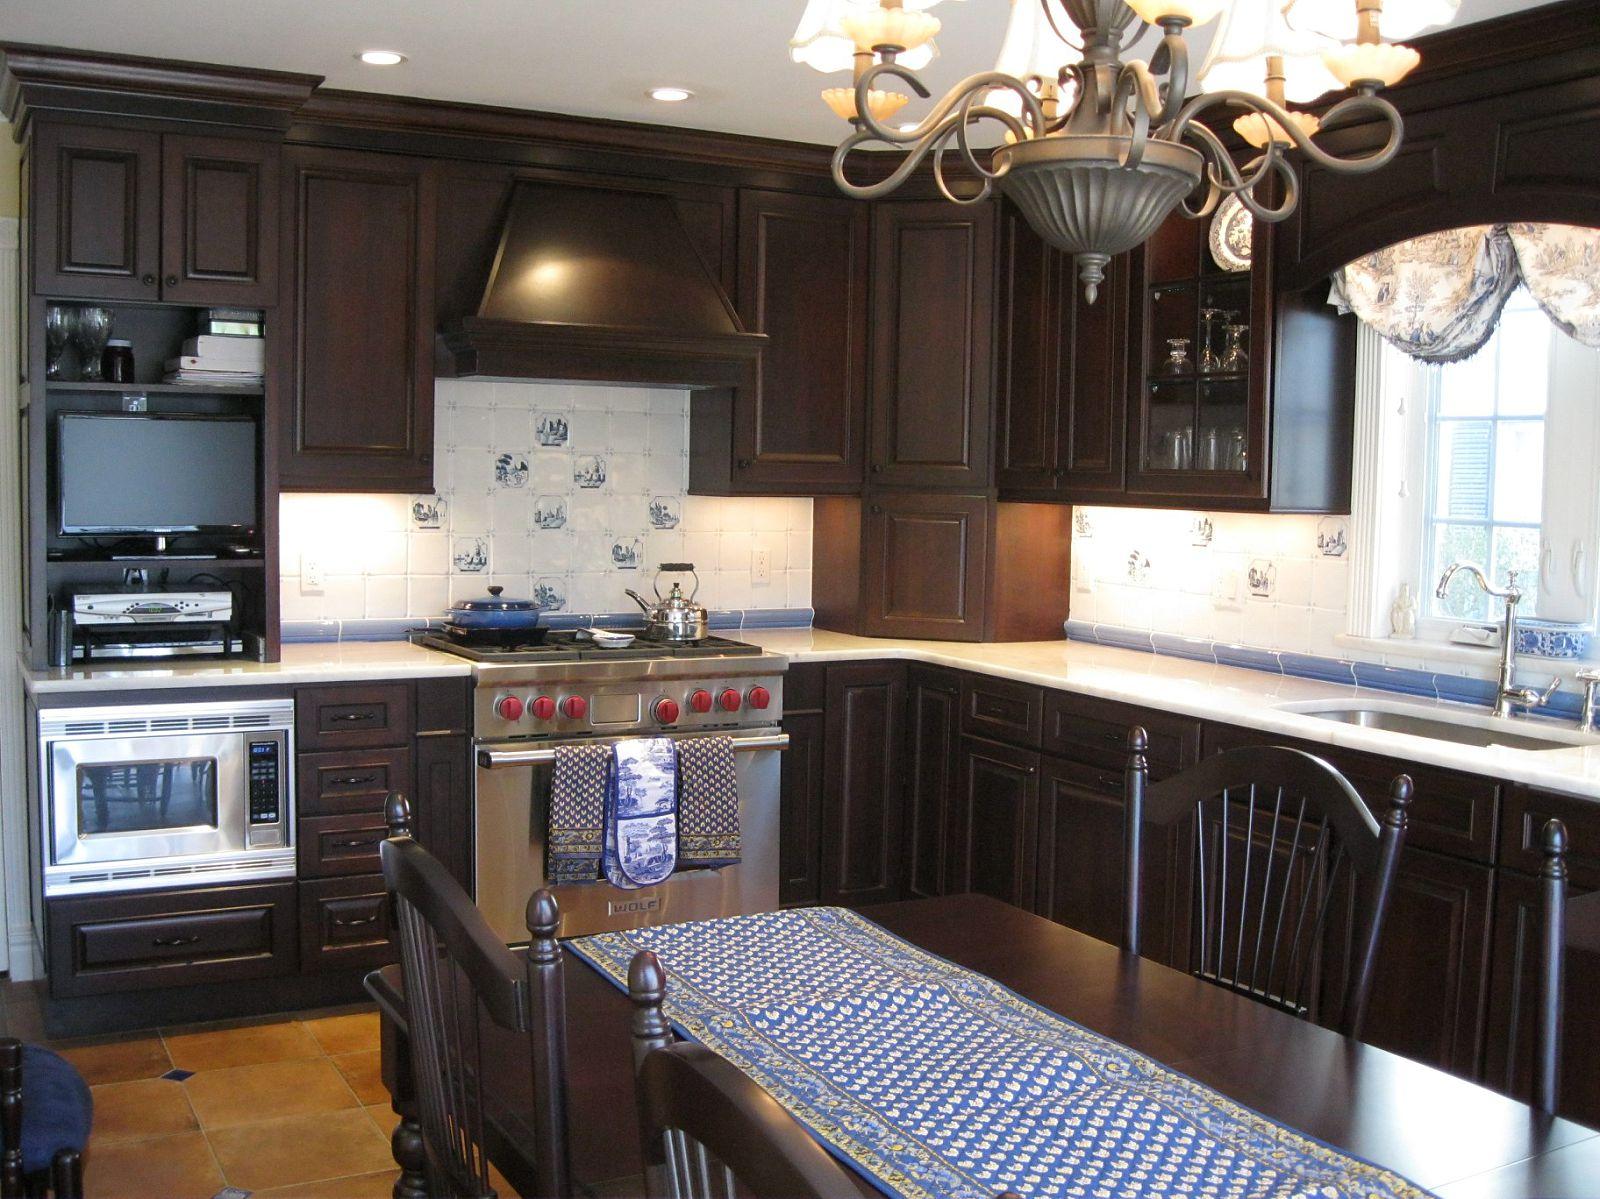 Custom Cabinetry Toni Sabatino Style